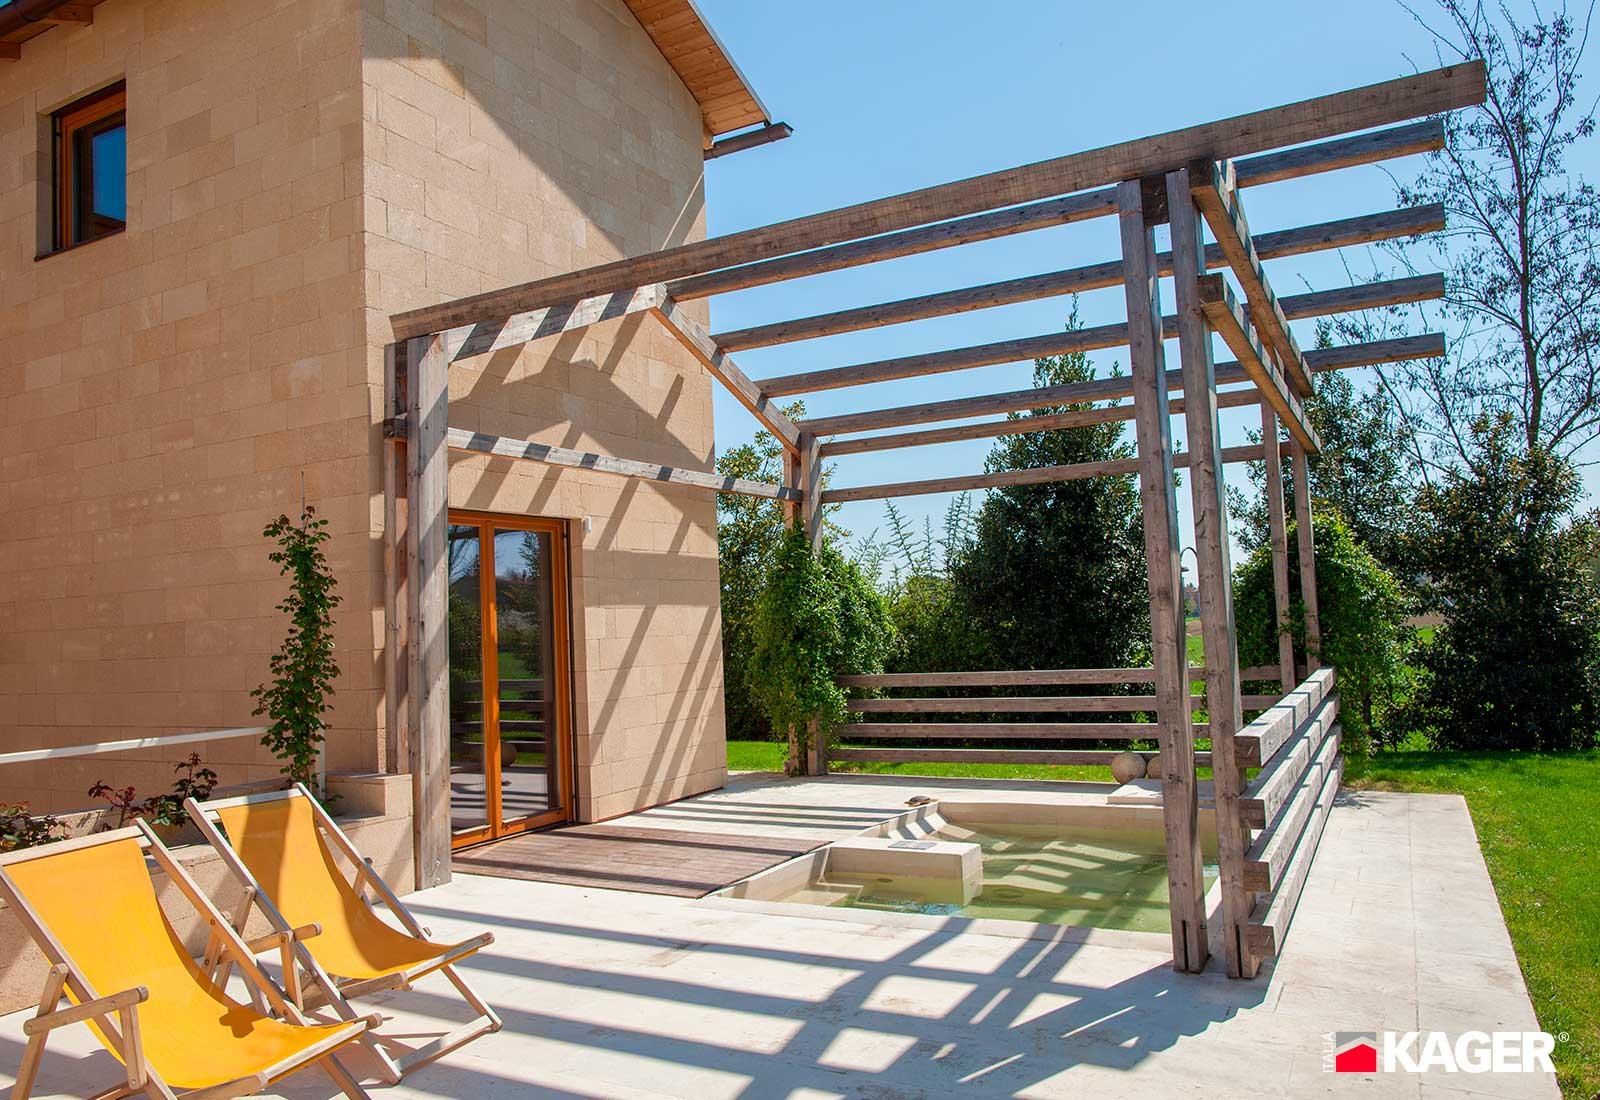 Casa-in-legno-Forli-Kager-Italia-08